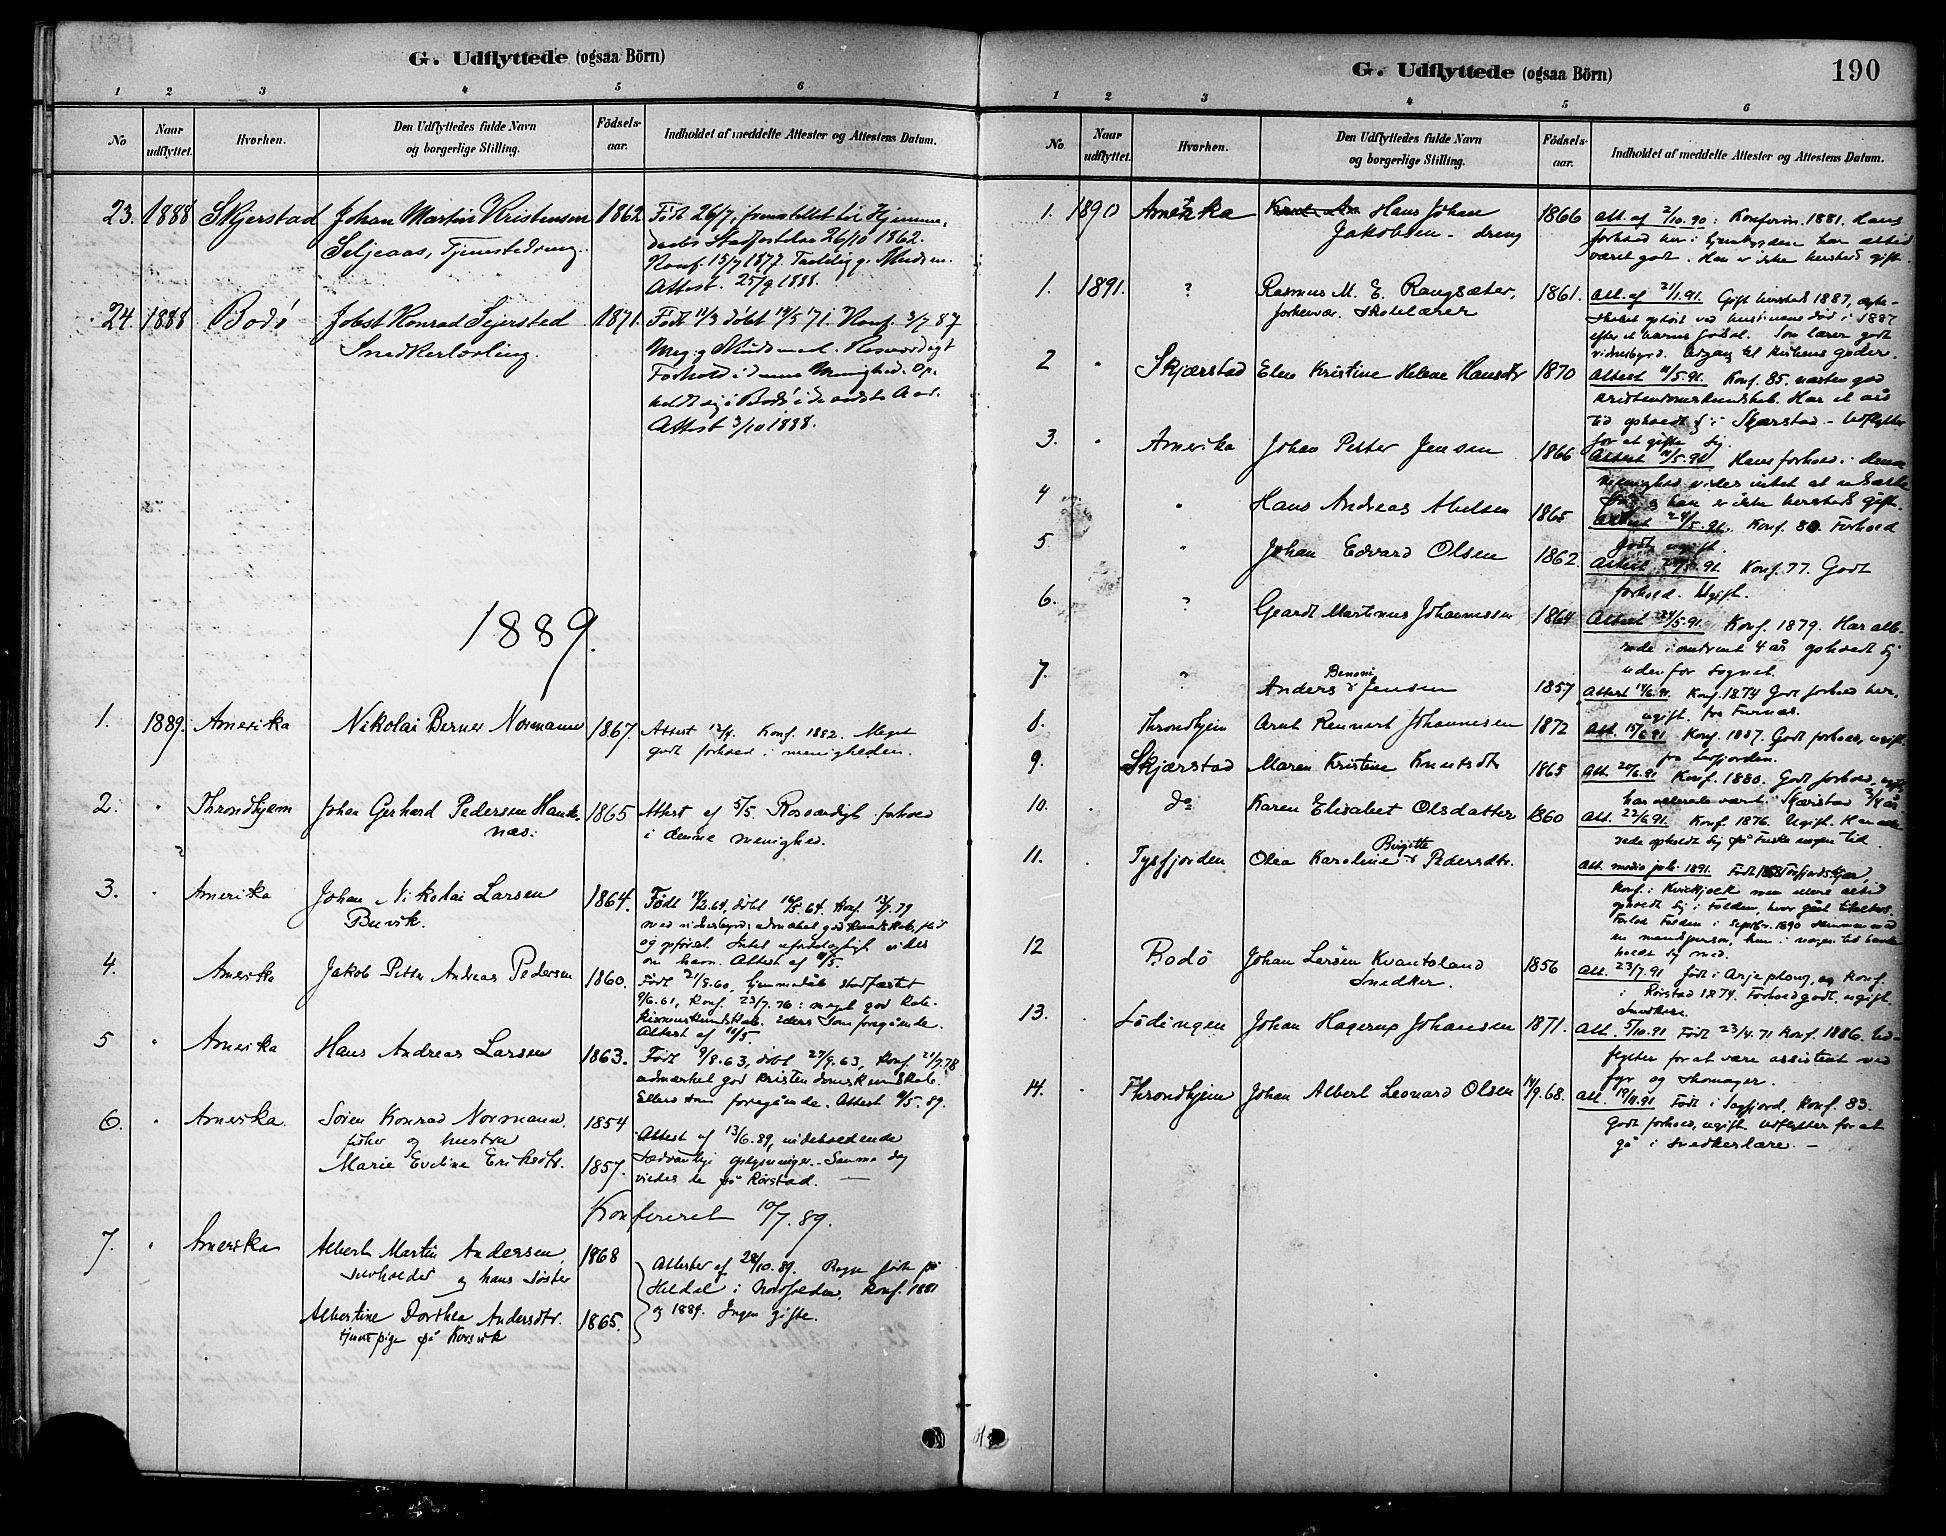 SAT, Ministerialprotokoller, klokkerbøker og fødselsregistre - Nordland, 854/L0777: Ministerialbok nr. 854A01 /1, 1883-1891, s. 190